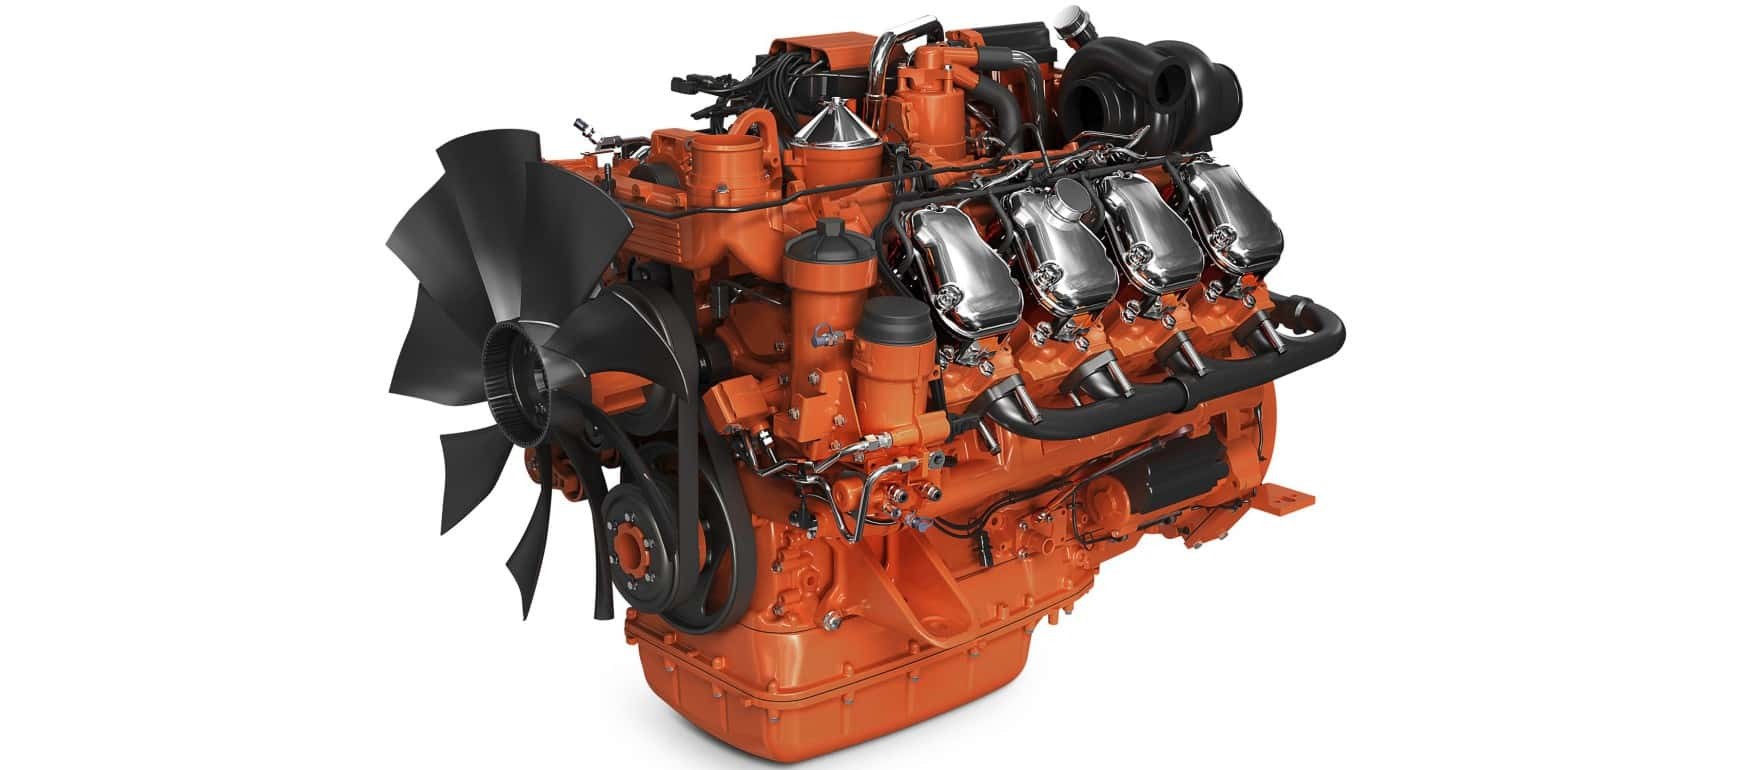 Мотор V8 Scania